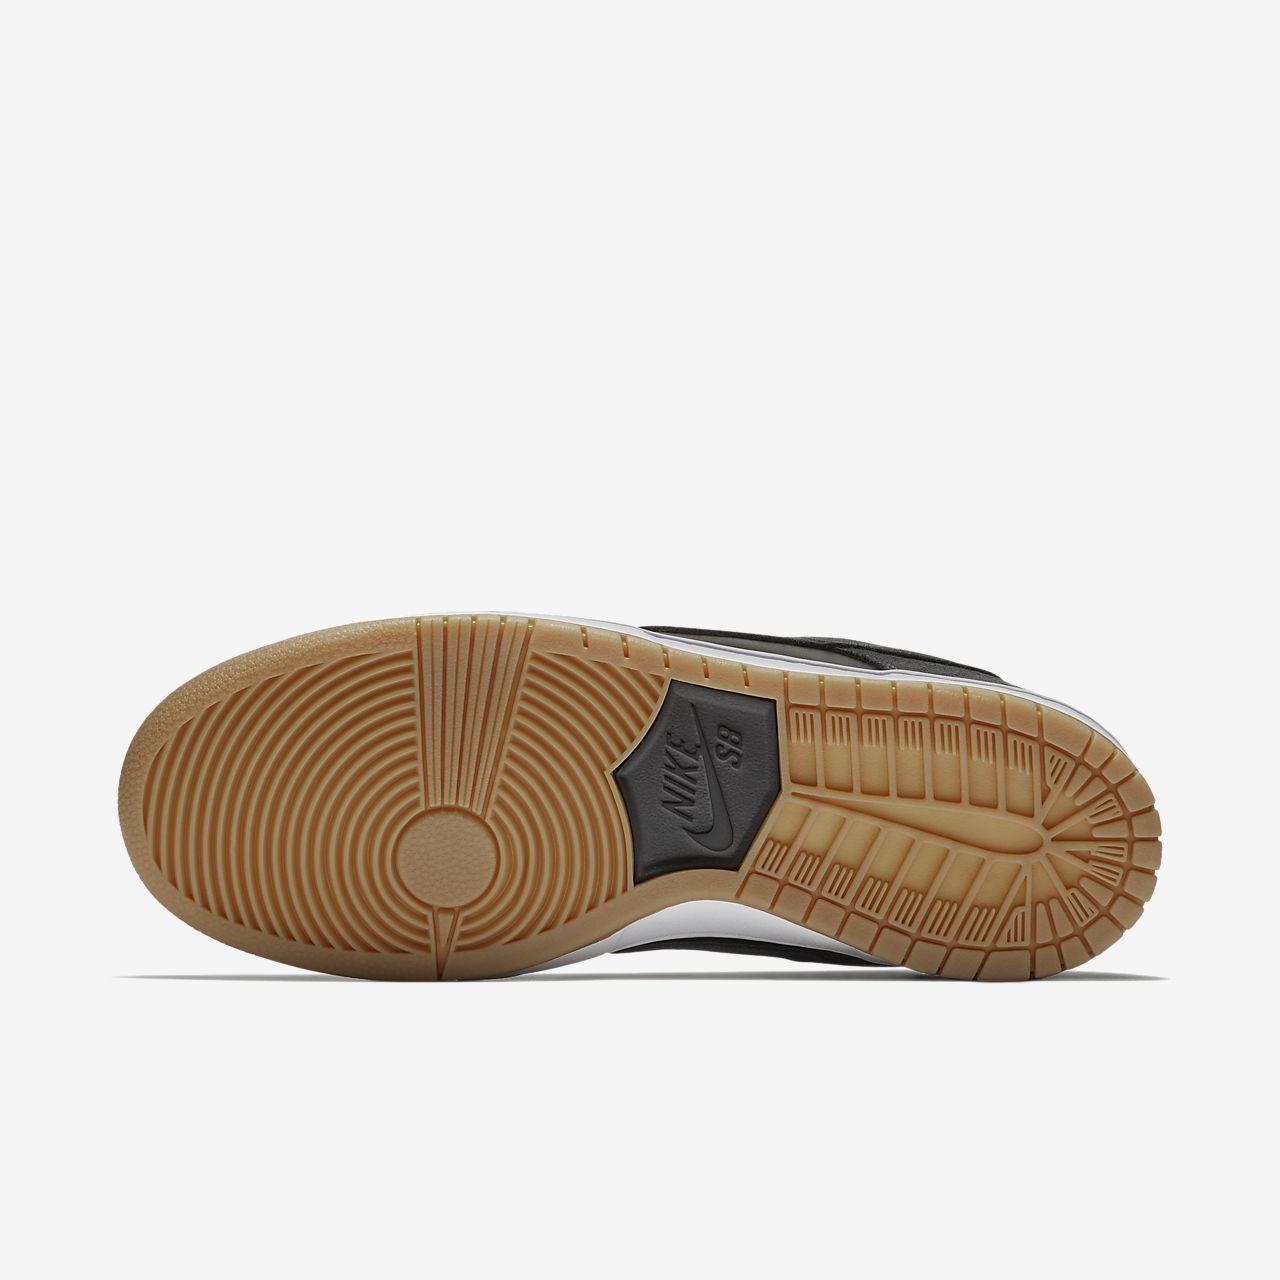 info for dc9a6 5a117 ... italy chaussure de skateboard nike sb dunk low trd pour homme eacc4  62d8e